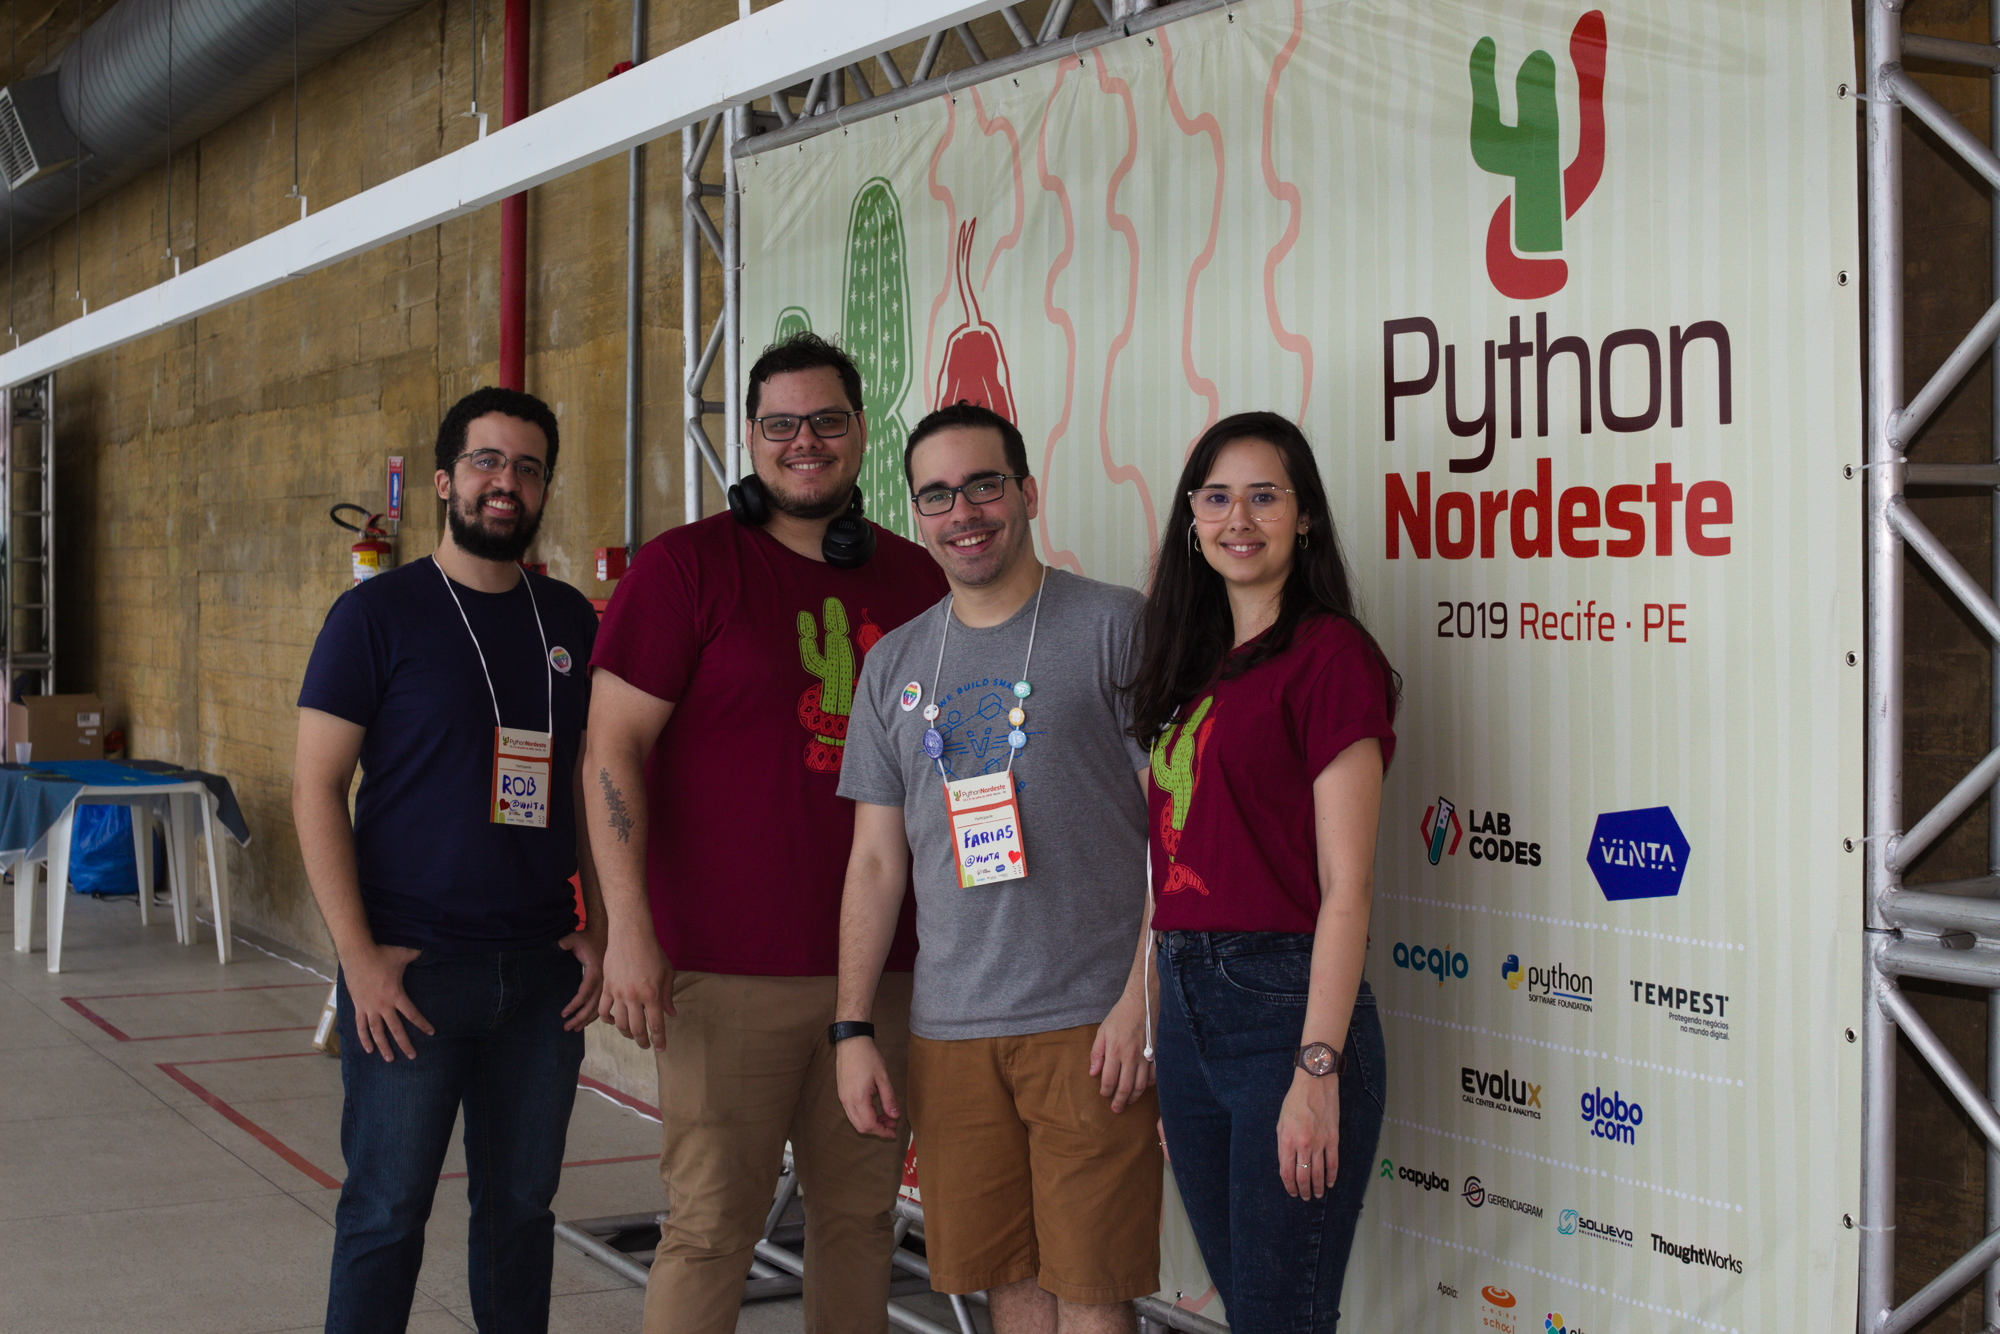 Vinta na Python Nordesde 2019